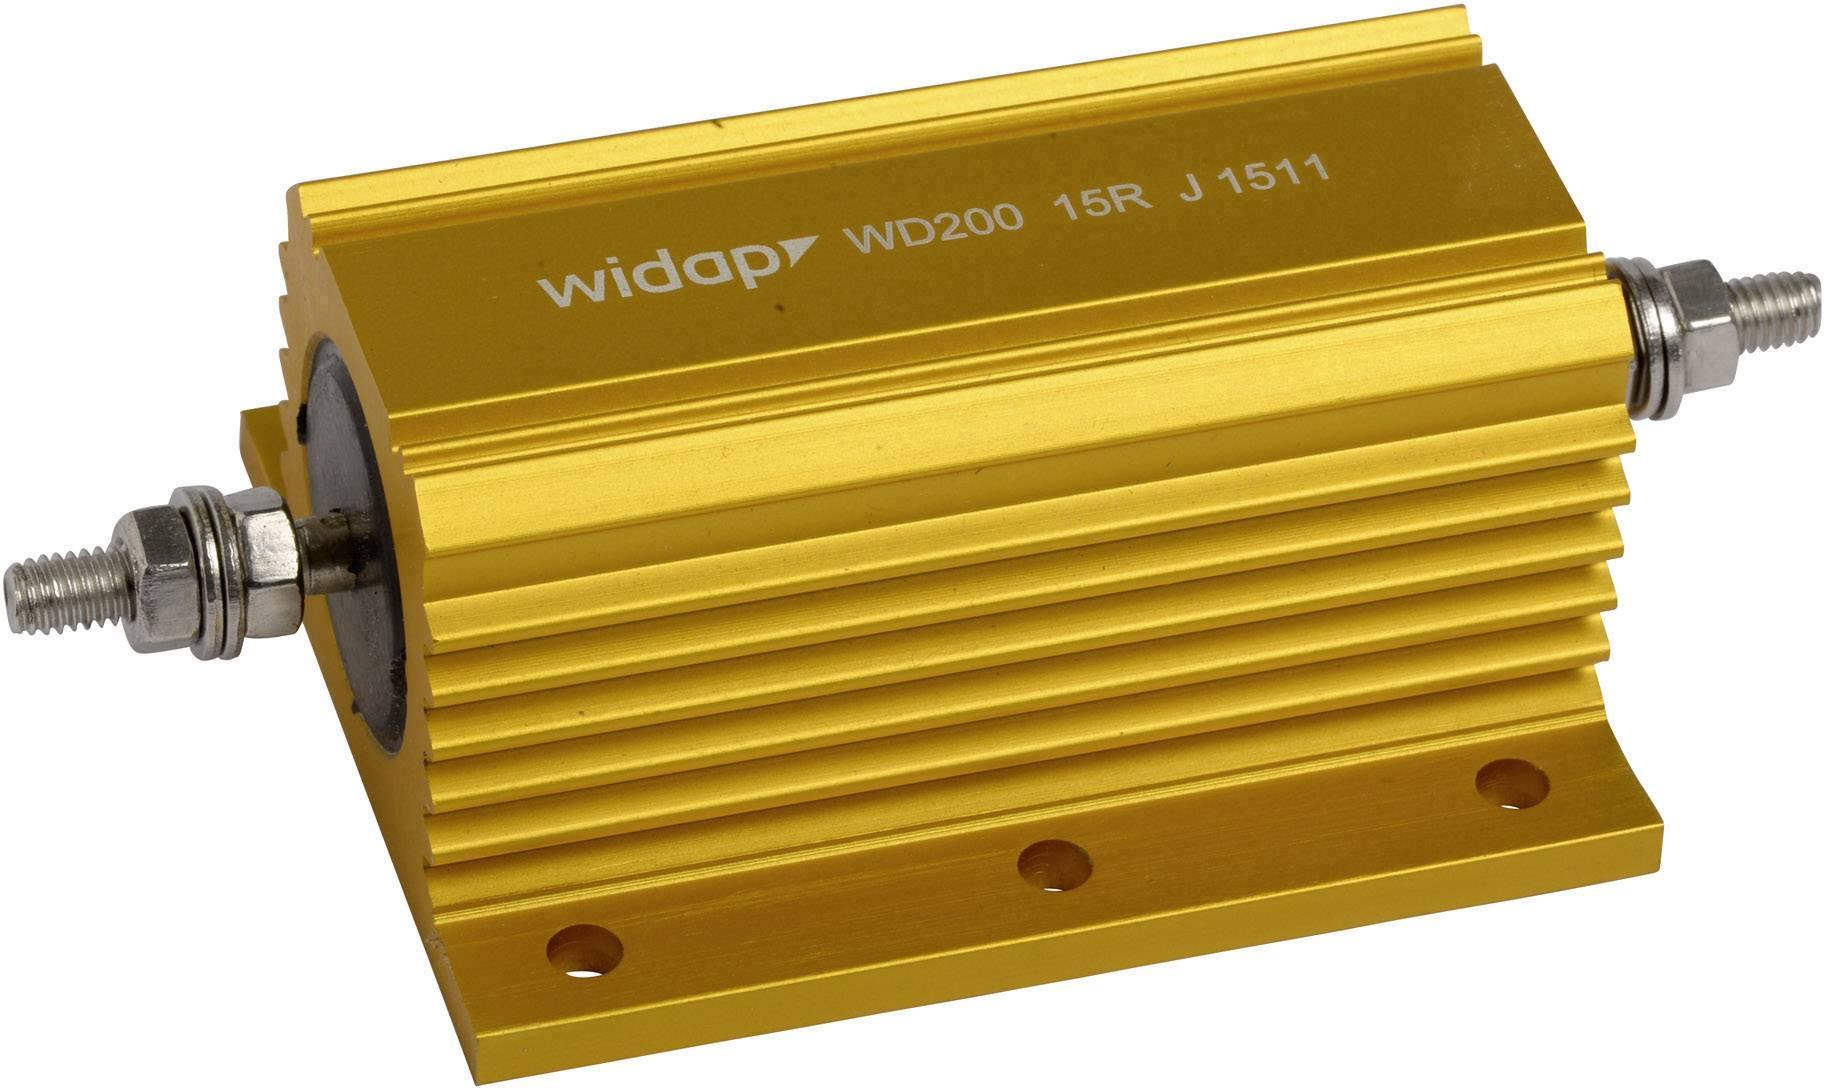 Drôtový rezistor Widap 160160, hodnota odporu 330 Ohm, 200 W, 1 ks